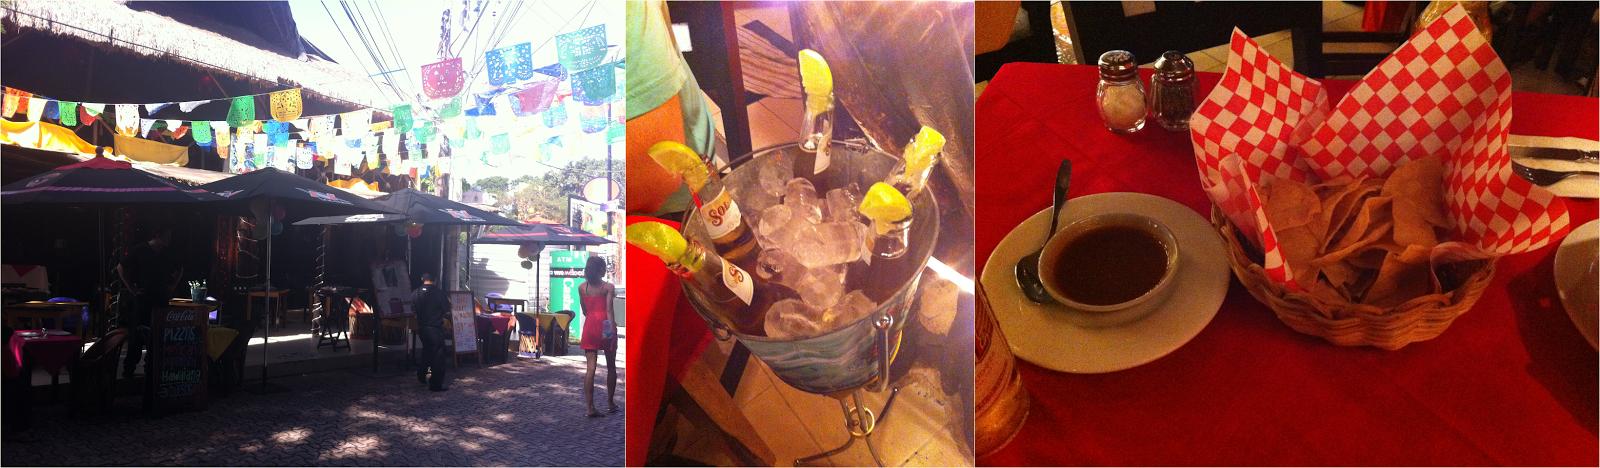 Frida's, camarão, peixe, seafood, nachos, Playa Del Carmen, México, Caribe, playa, cerveja